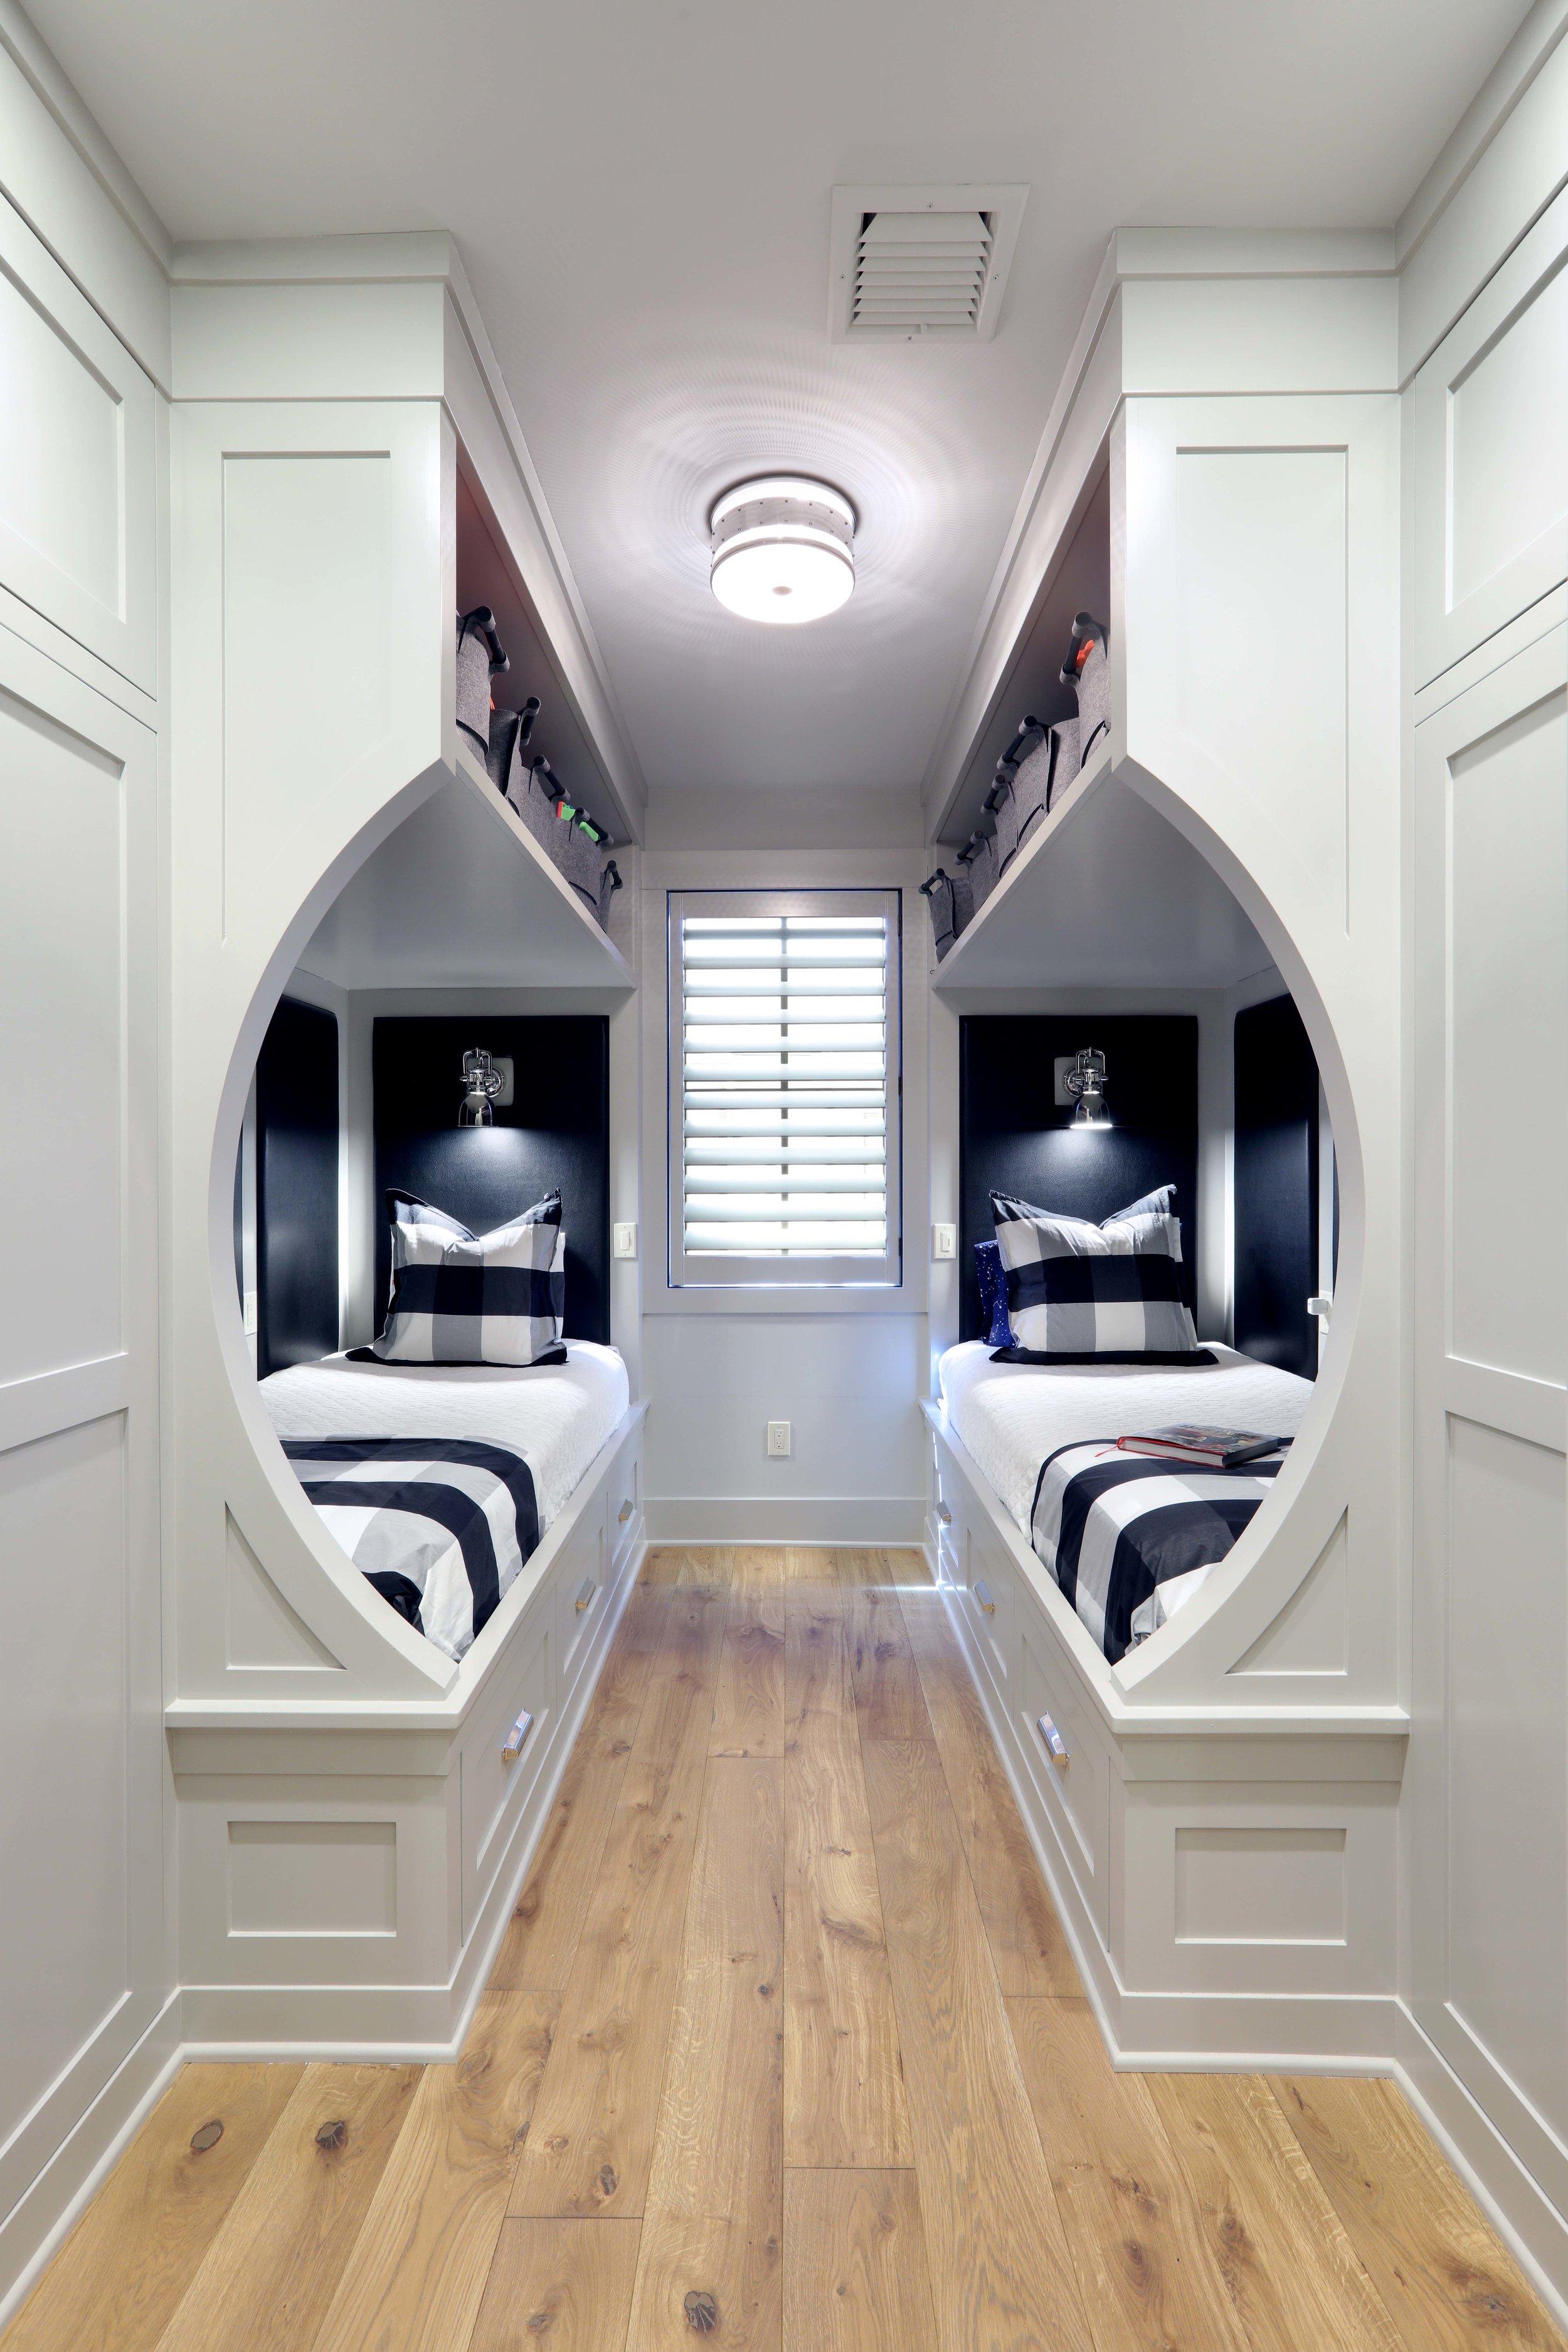 Vision-Interiors-Visbeen-Showroom-Grand-Rapids-Kids-Bunks-Bunk-Beds.jpg